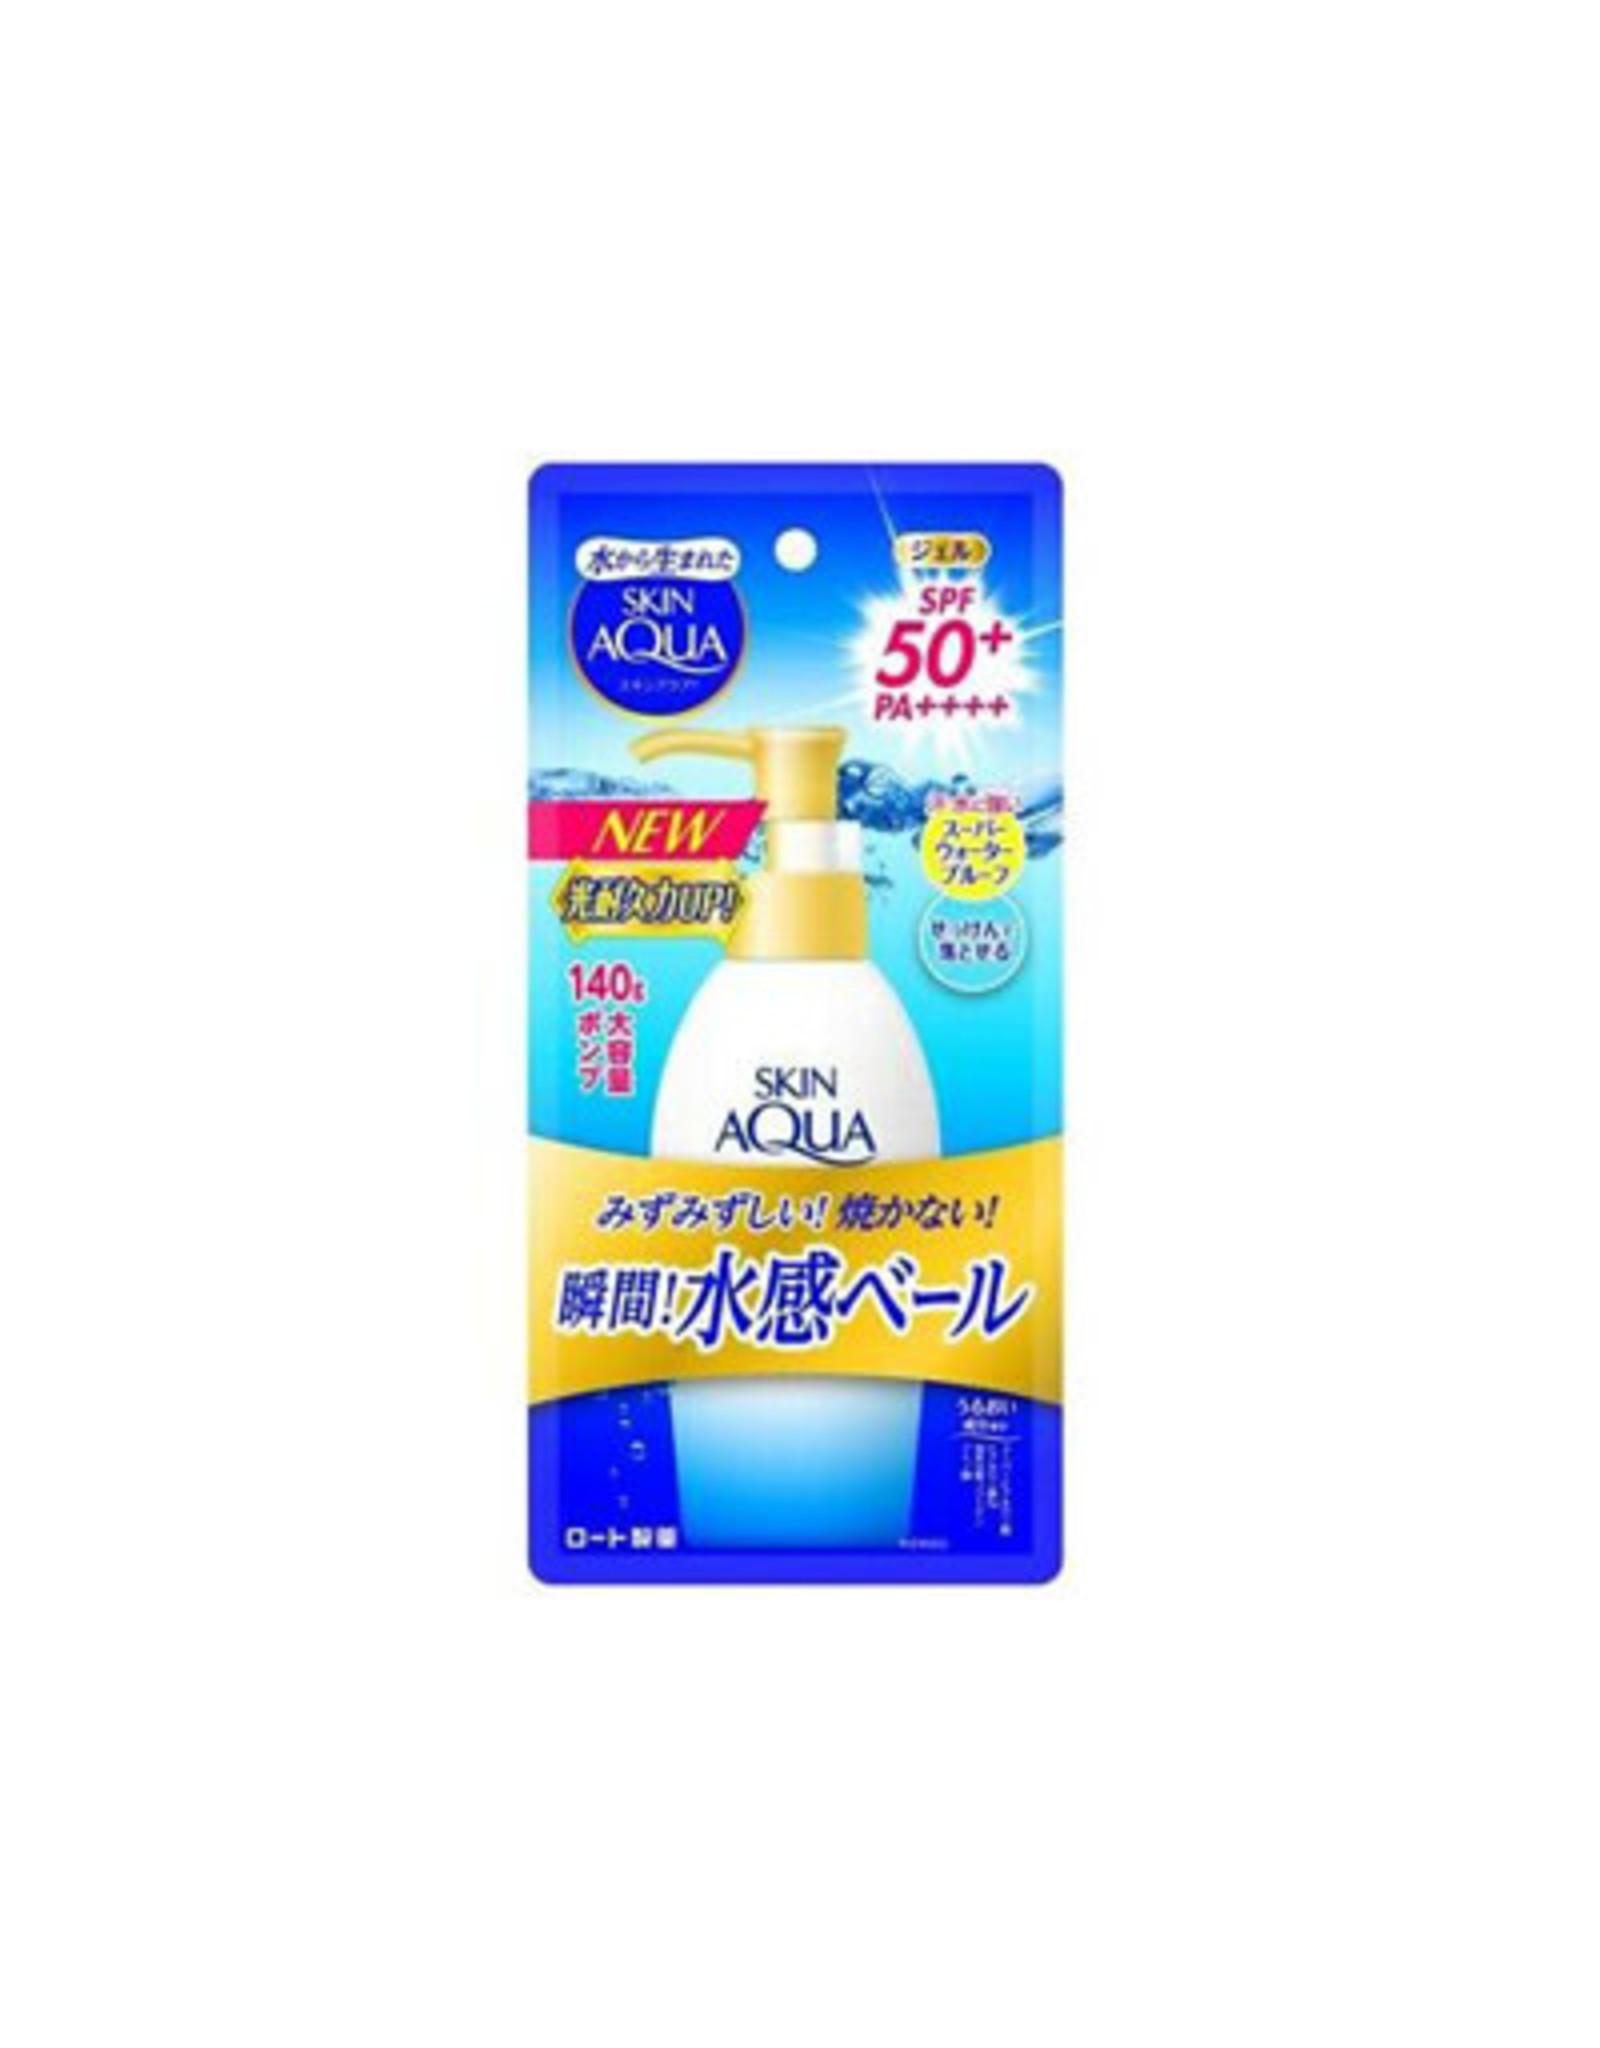 Rohto Rohto Skin Aqua Super Moisture Gel Pump Type SPF50+PA++++ 140g